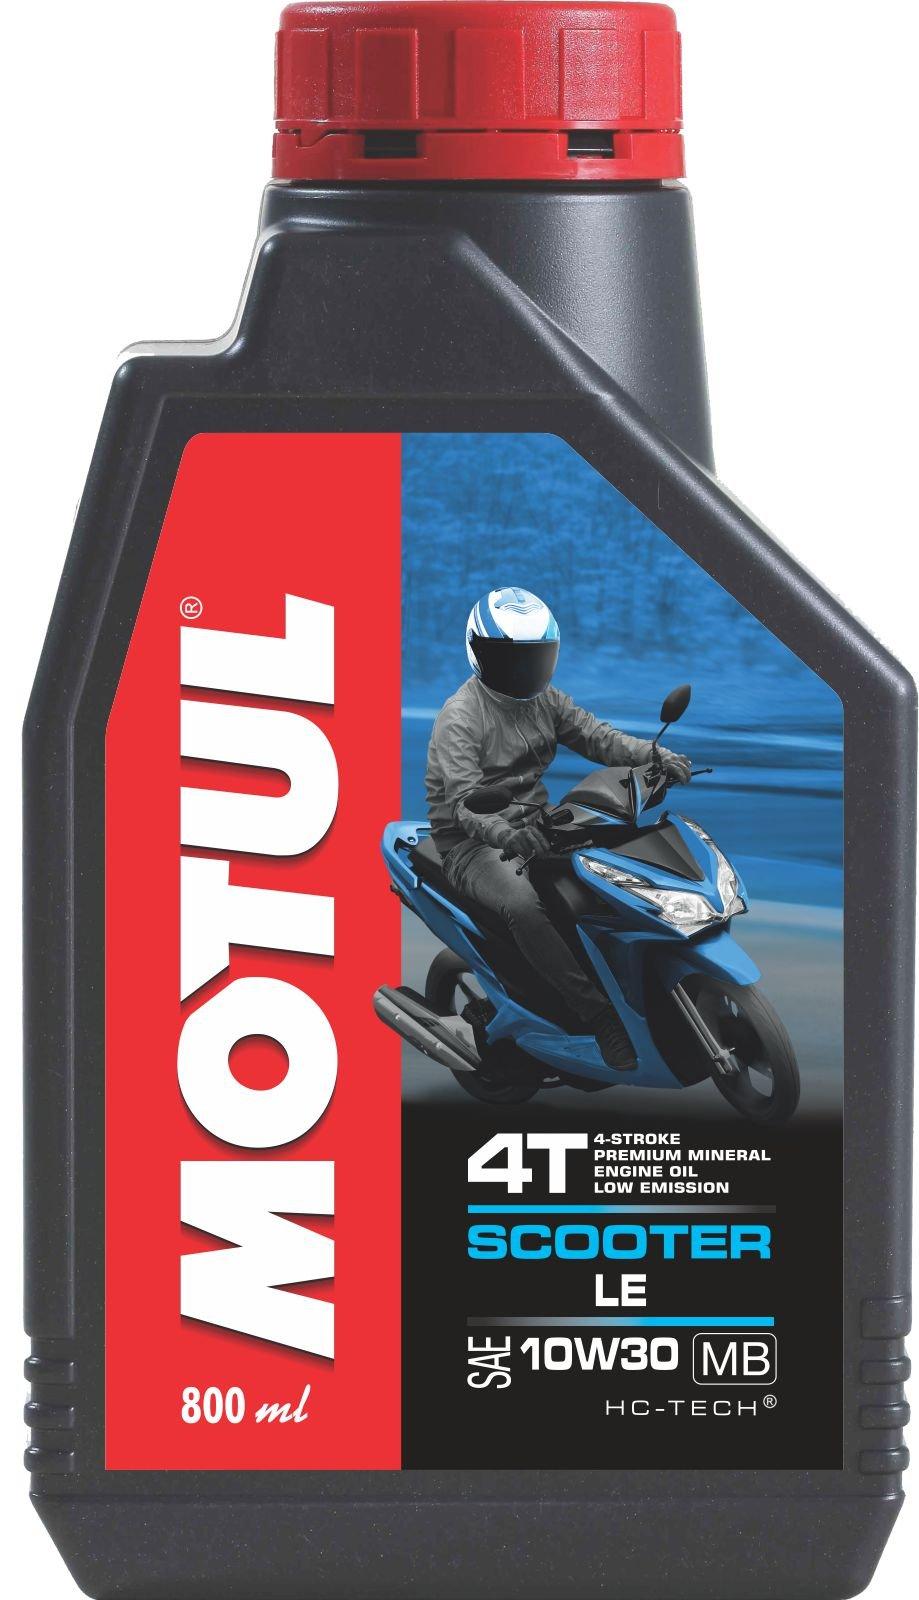 Motul Scooter LE 10W30 Engine Oil (800 ml) product image